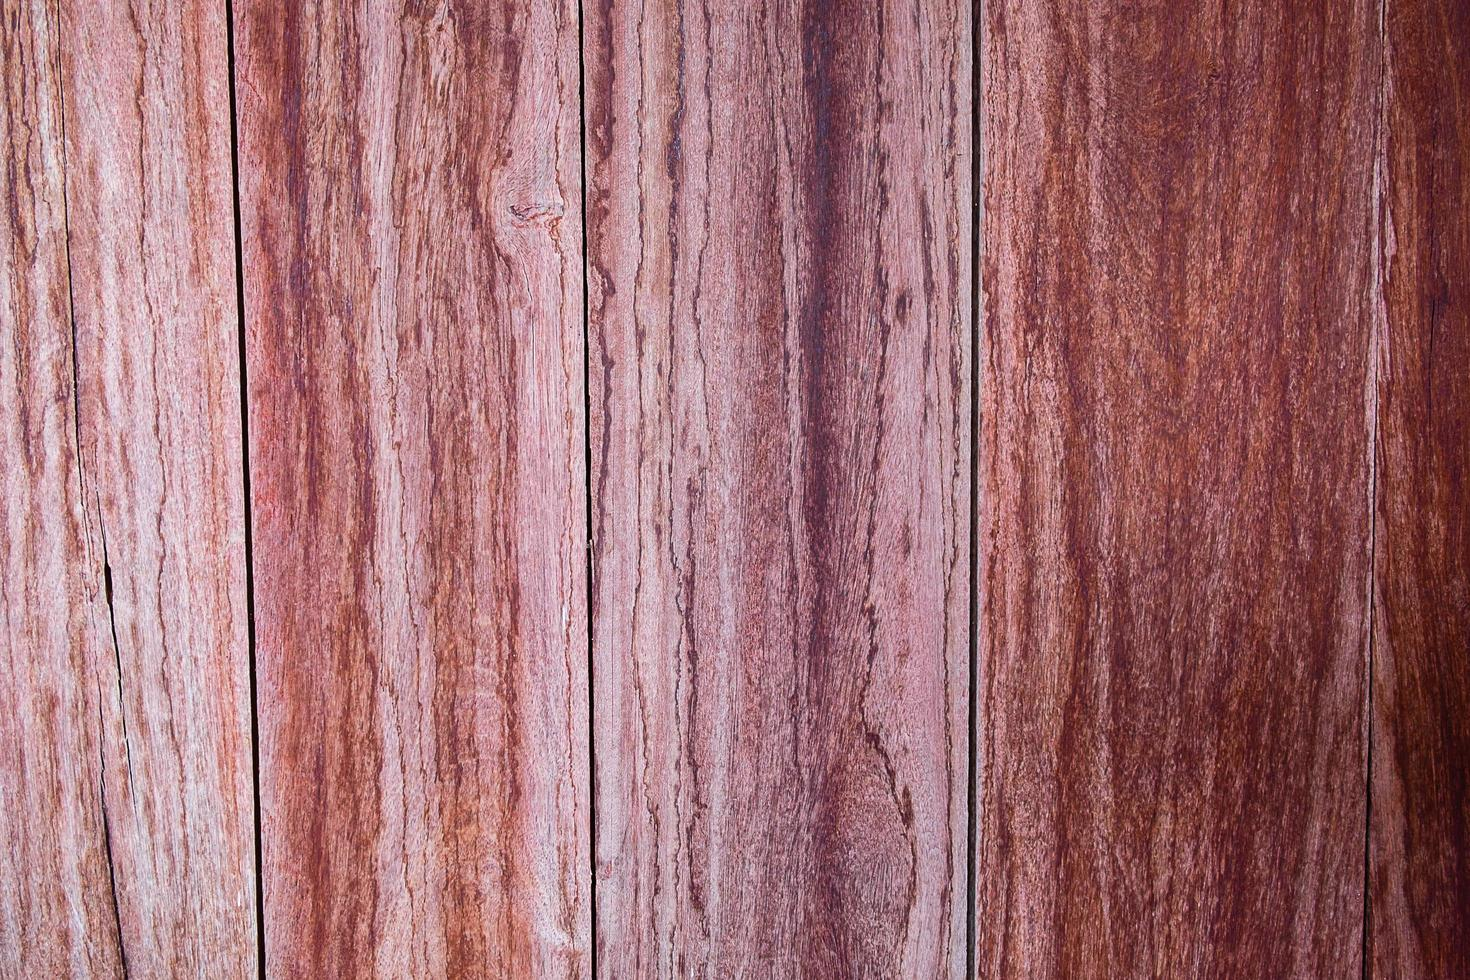 Holzplatte foto